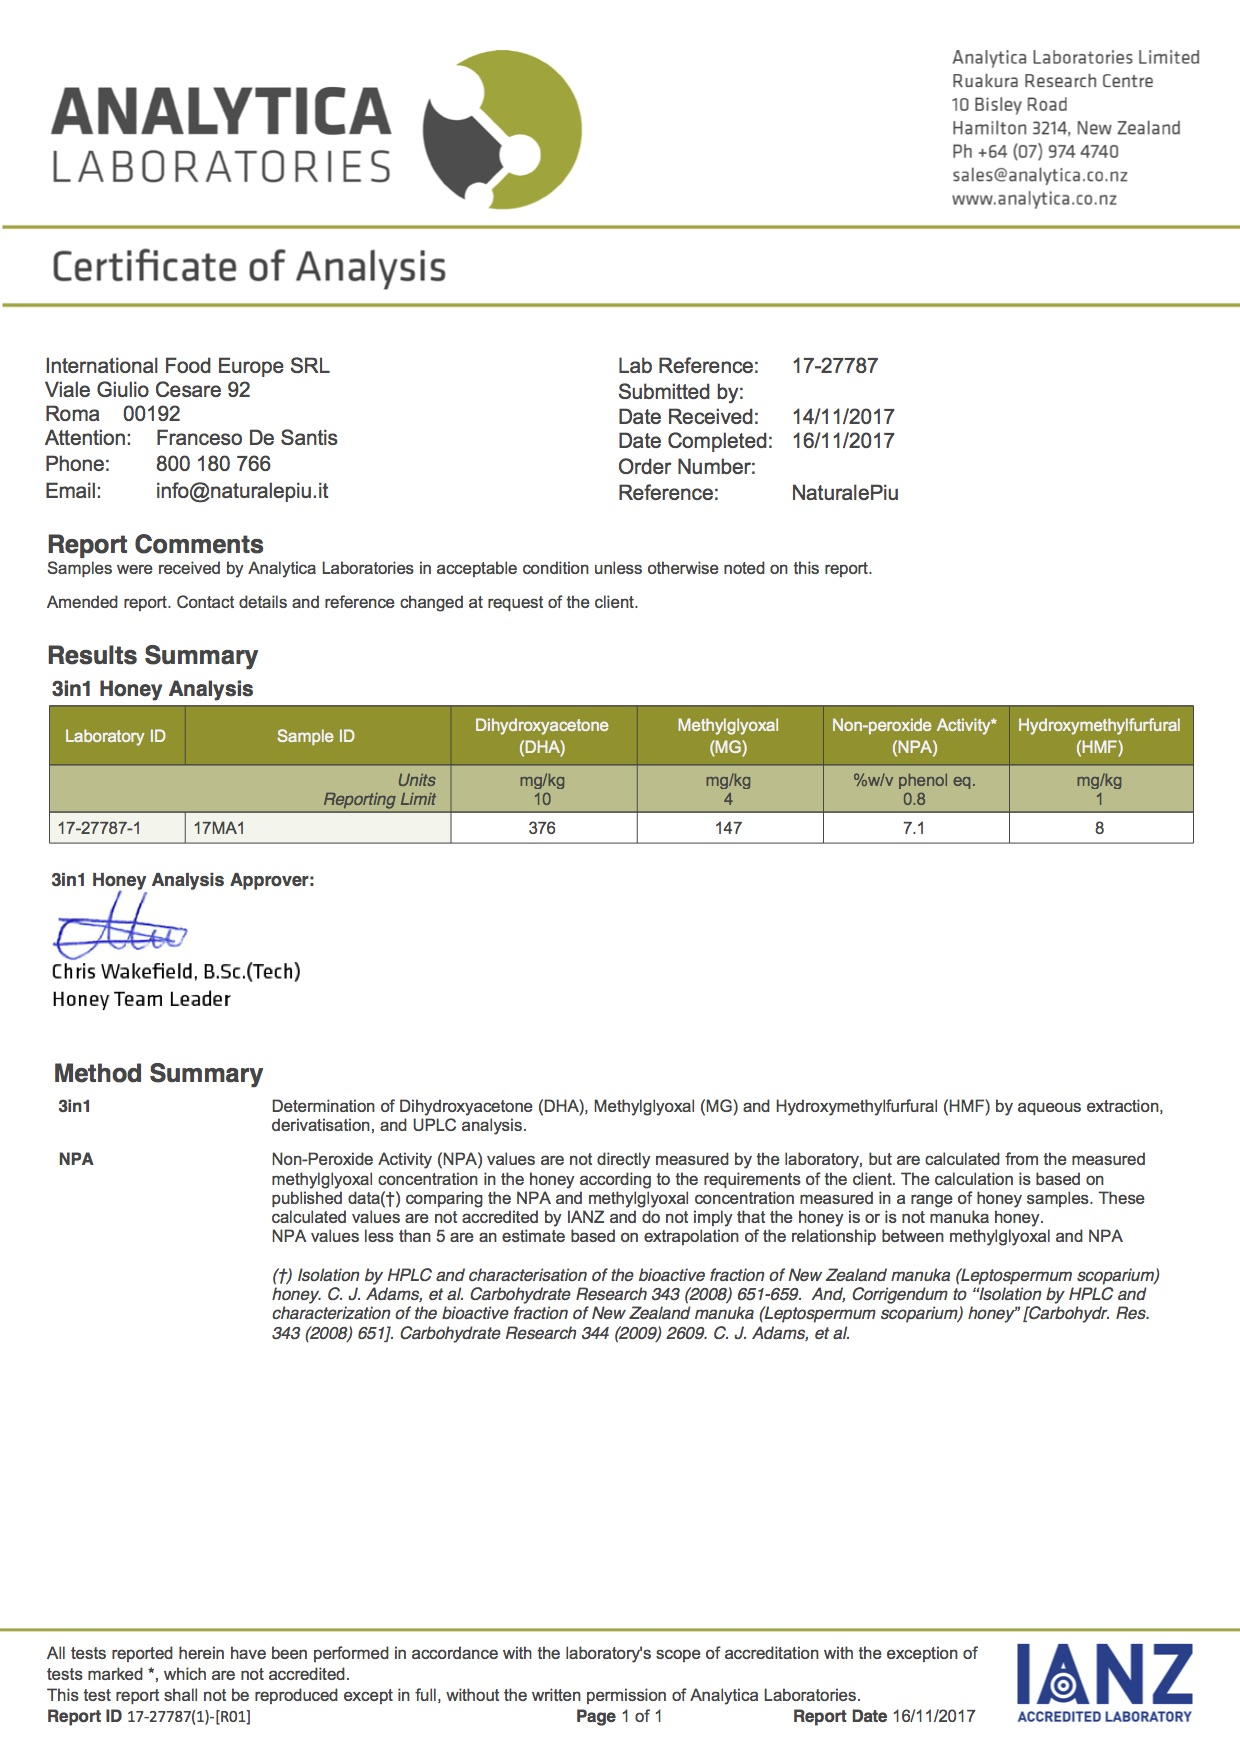 100 mgo 17MA1 test metilgiossale